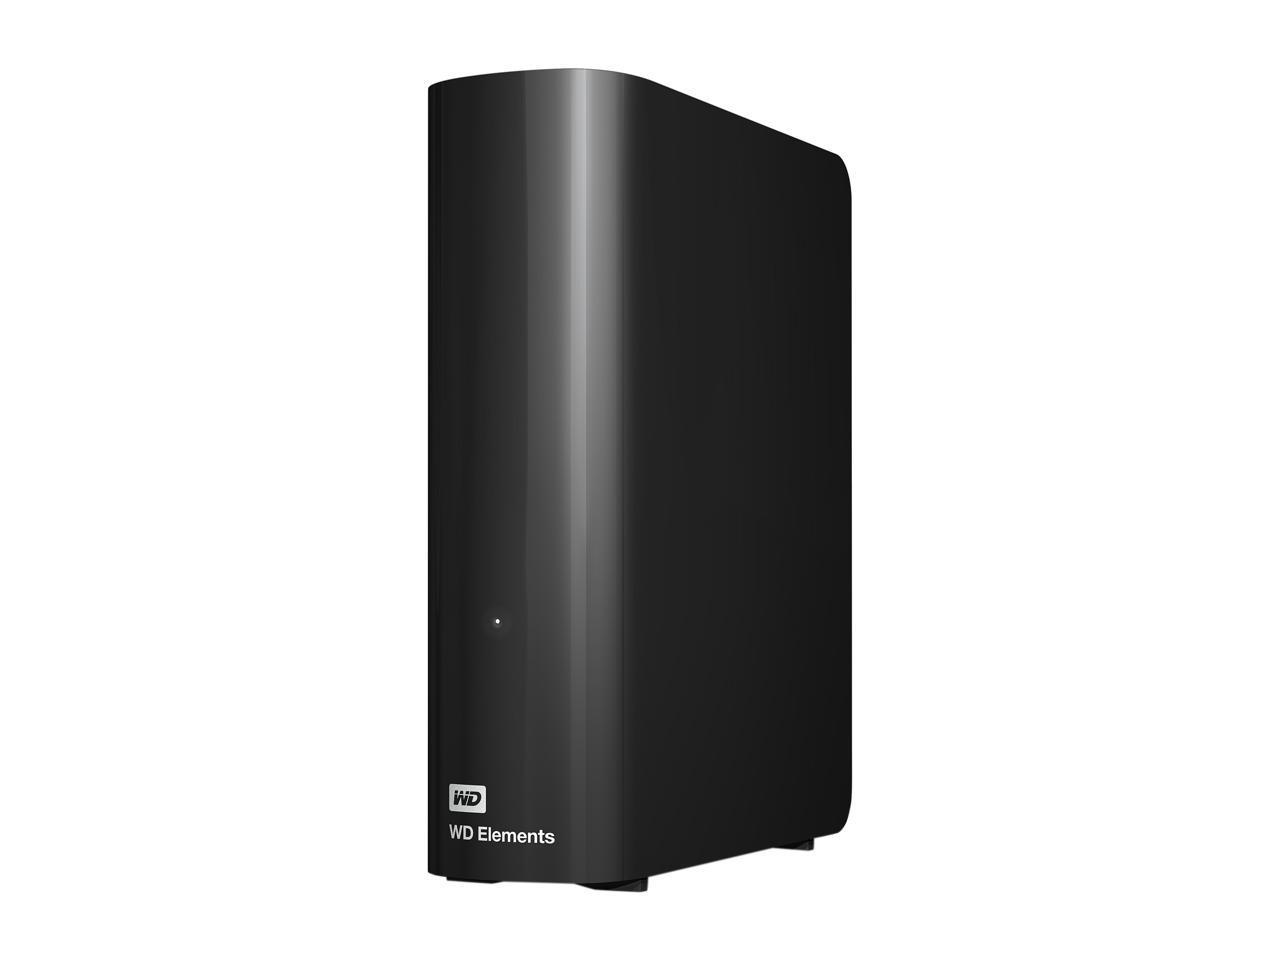 WD Elements 10TB USB 3.0 Desktop Hard Drive WDBWLG0100HBK-NESN Black $159.99